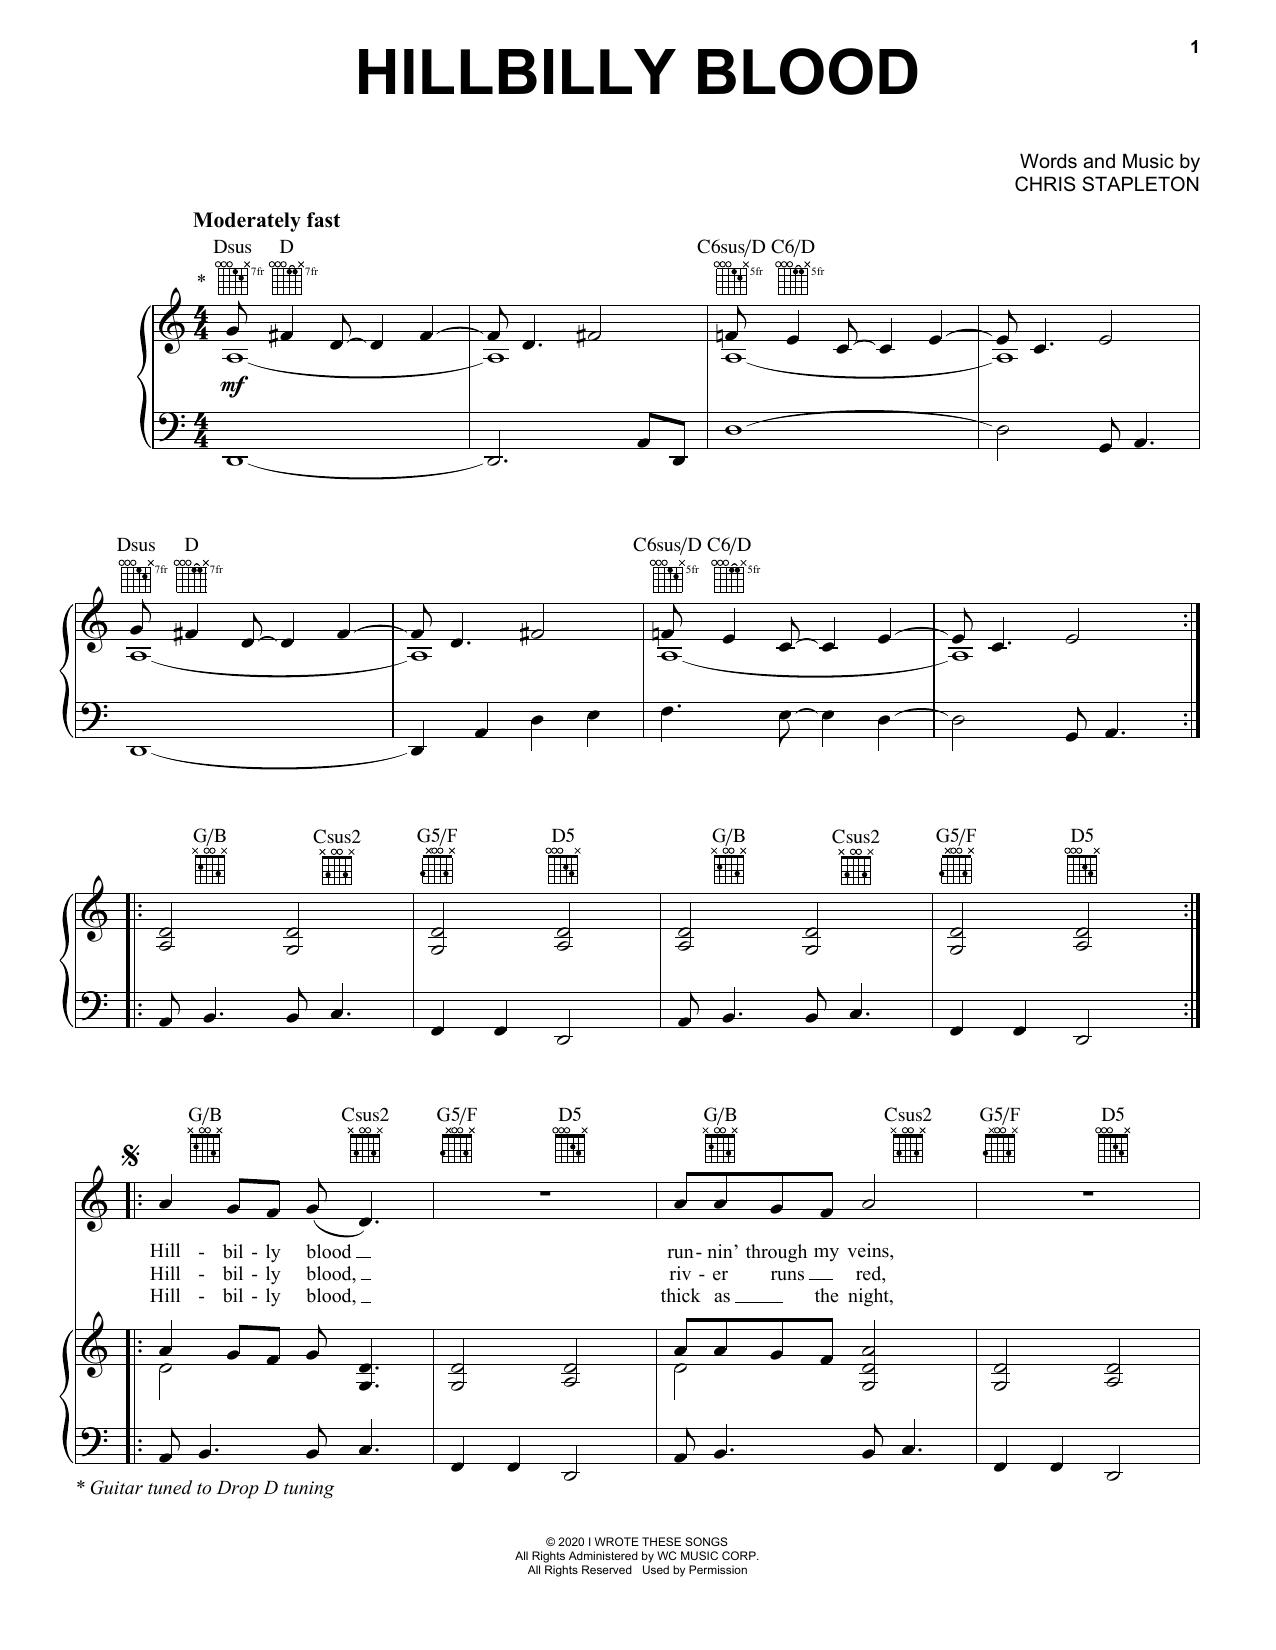 Chris Stapleton Hillbilly Blood sheet music notes printable PDF score